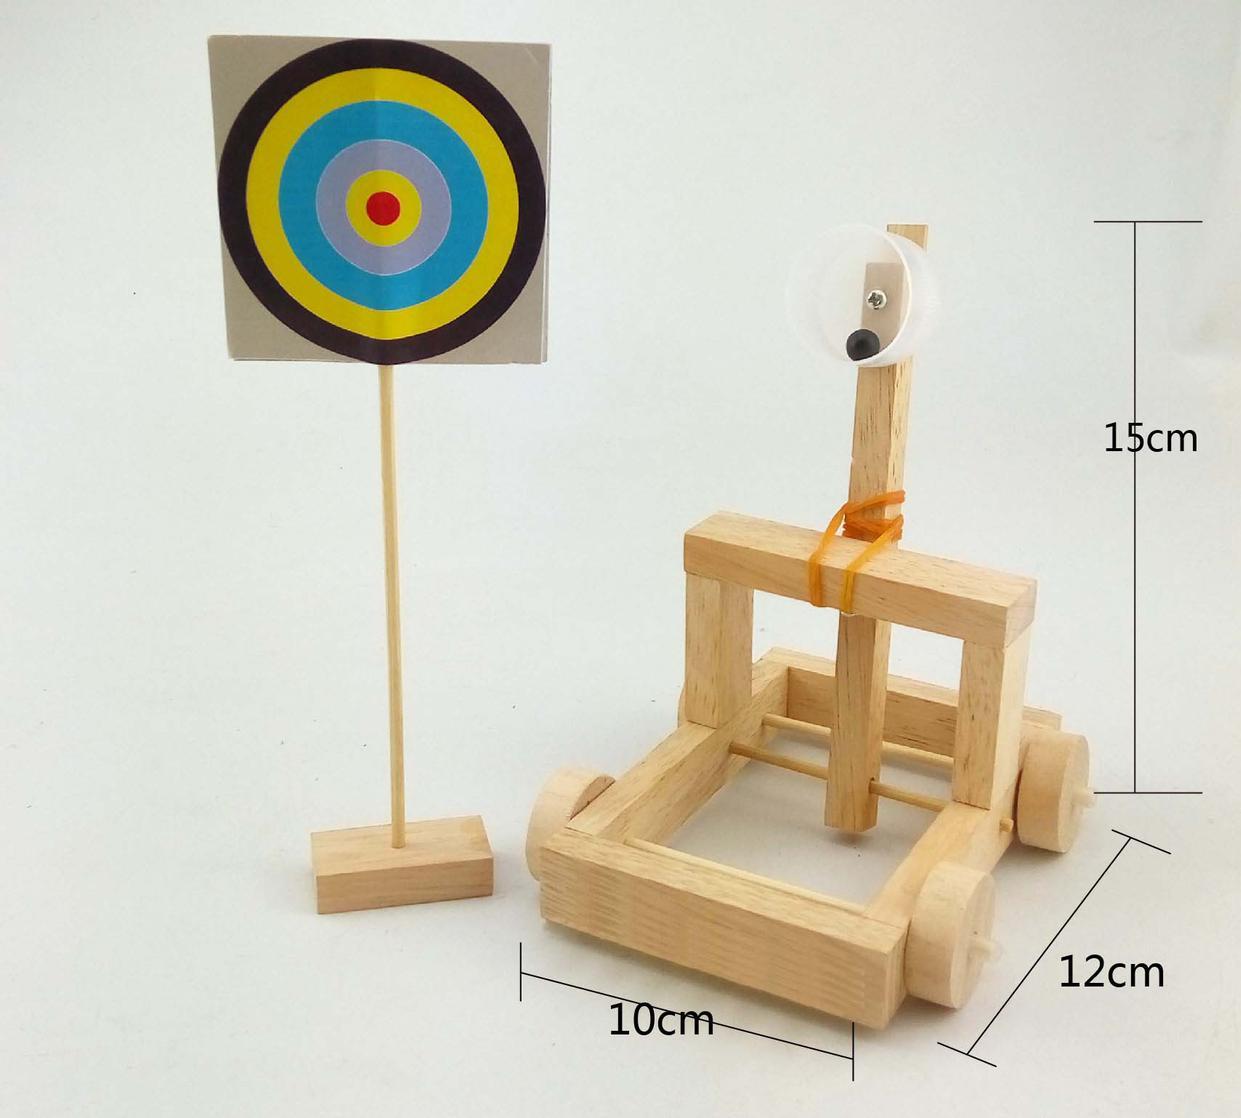 diy儿童科技小发明制作学生科学实验玩具拼装投石车